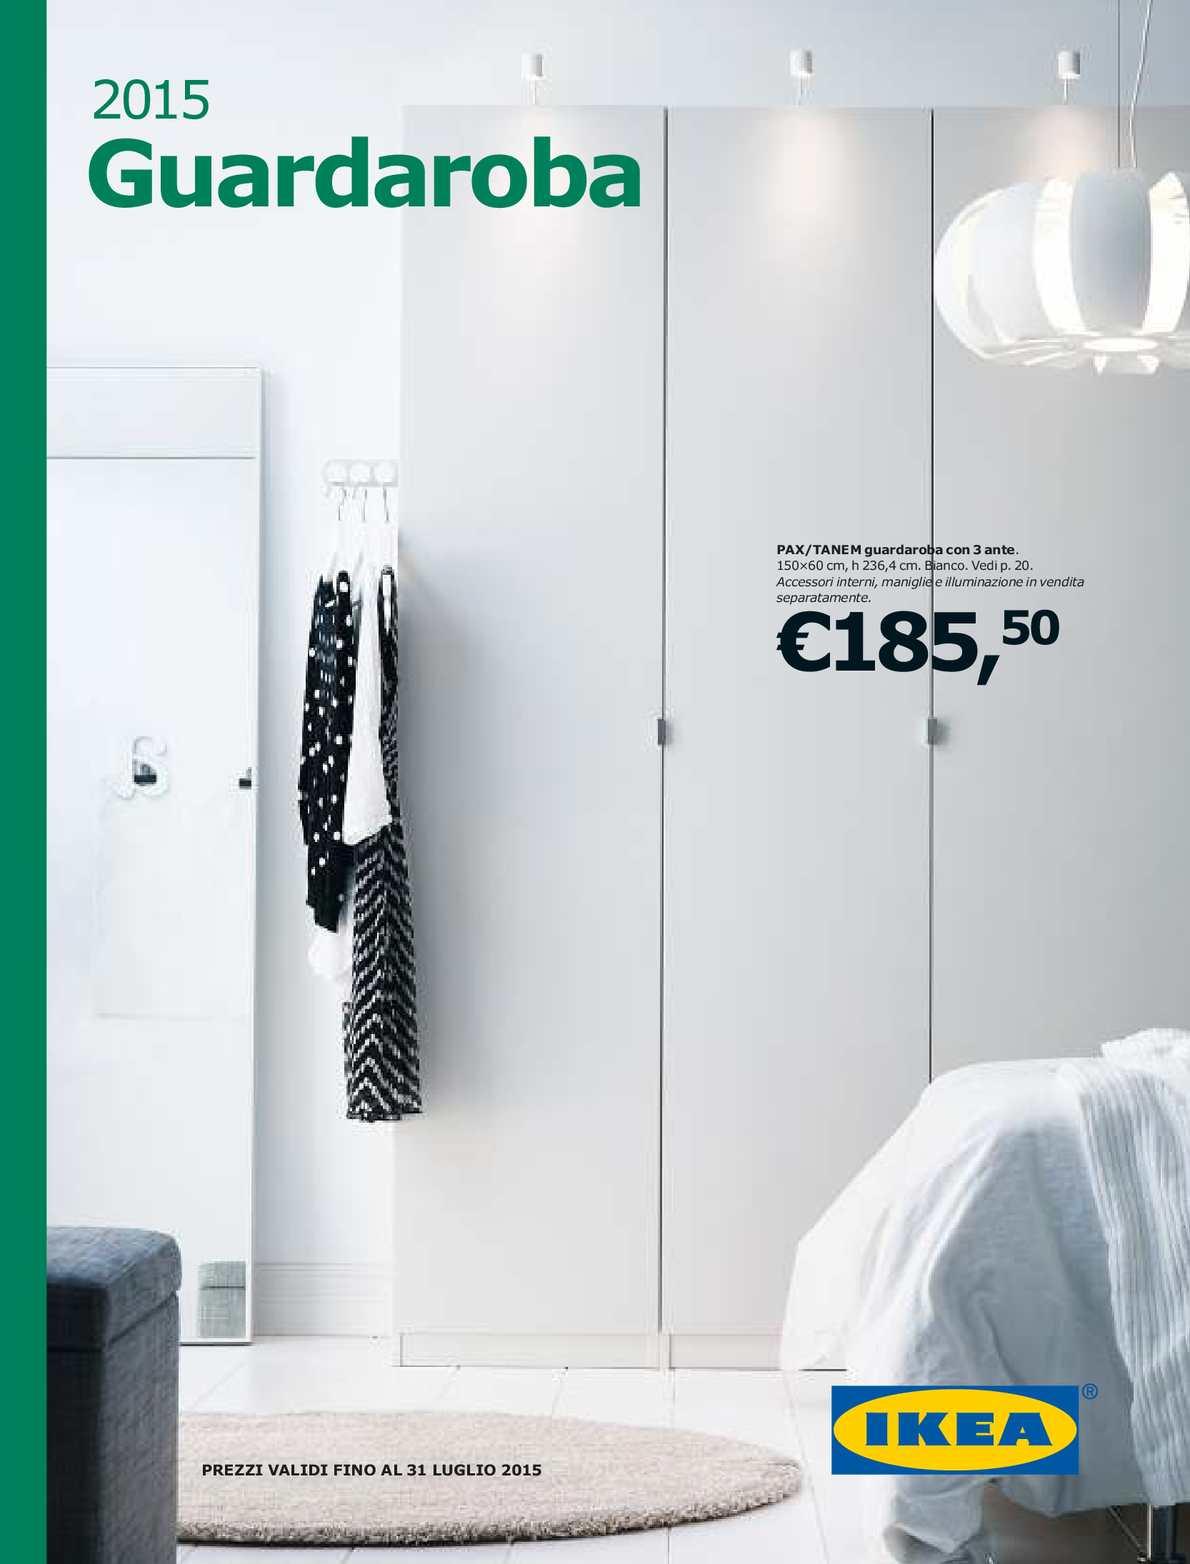 Ikea Pax Guardaroba 2 Ante.Calameo Catalogo Ikea Guardaroba 14 15